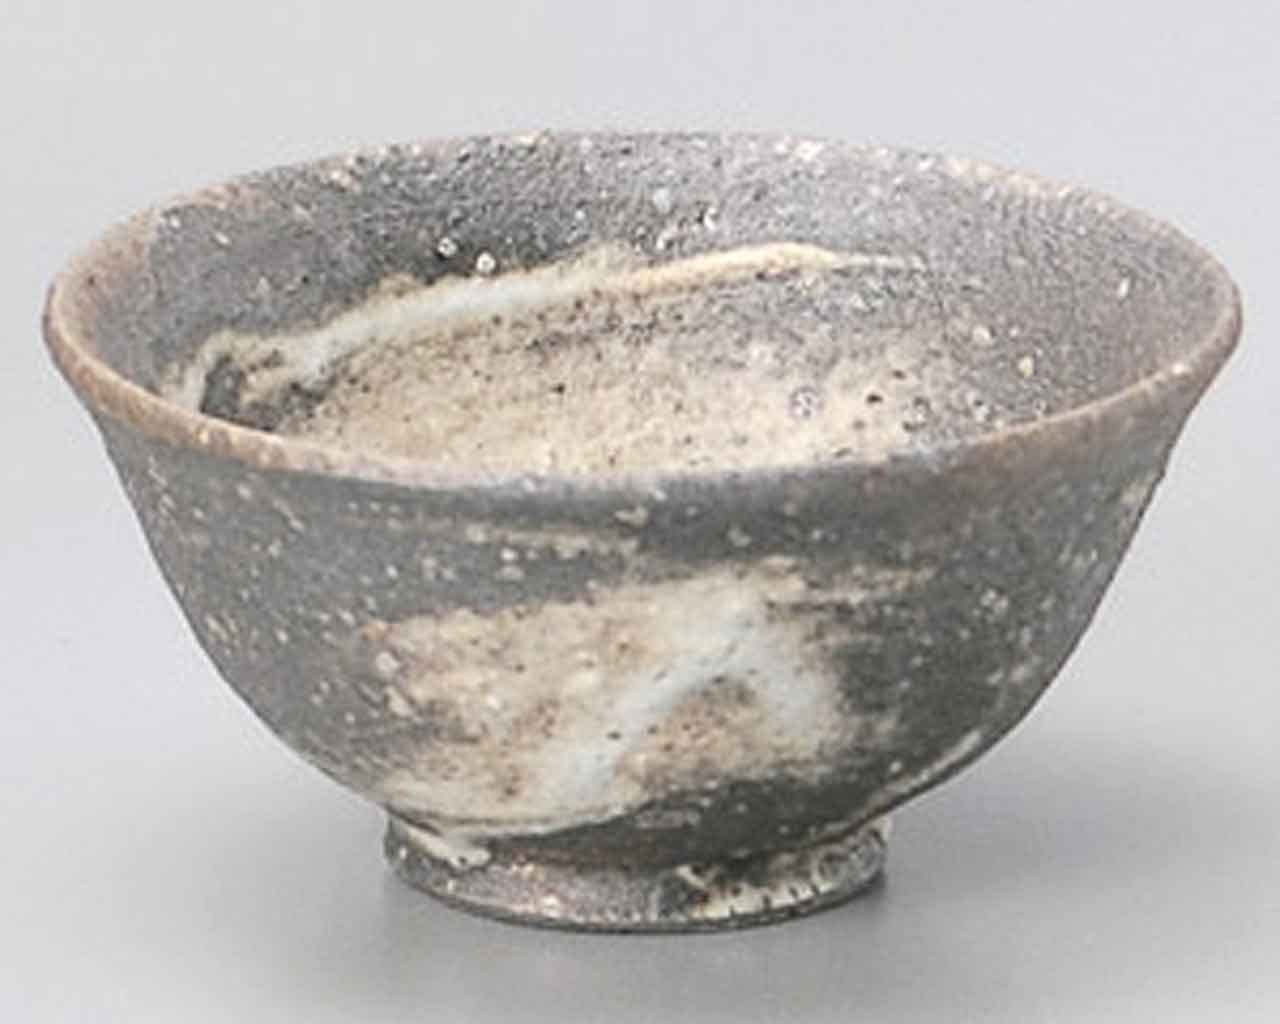 Yohen Brush 2.6inch Sake Cup Black Ceramic Made in Japan